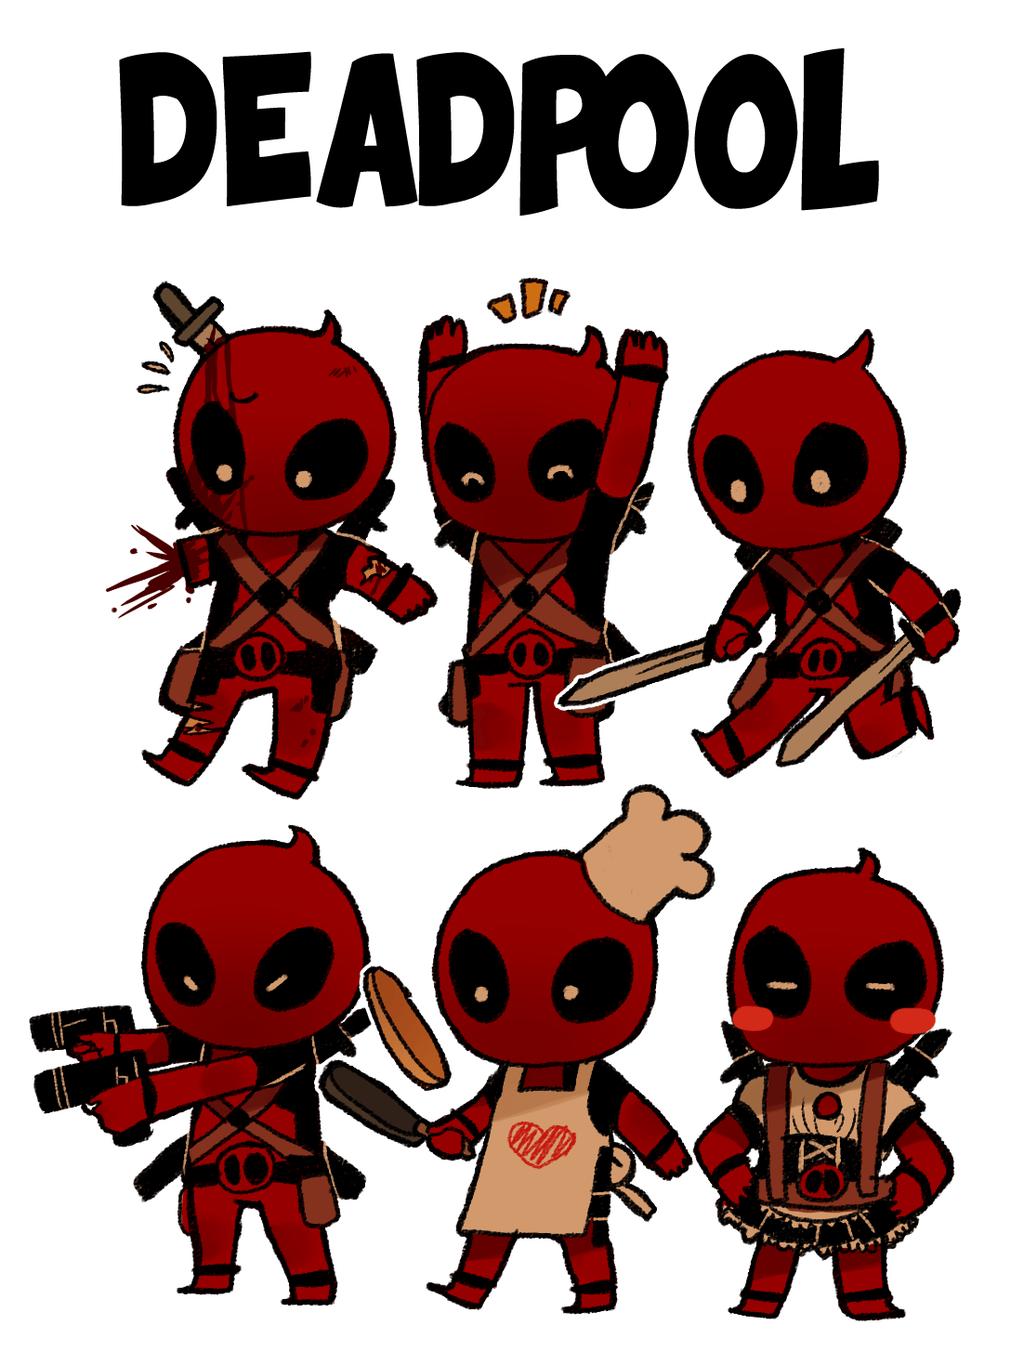 Deadpool Cartoon Wallpapers Wallpaper Cave